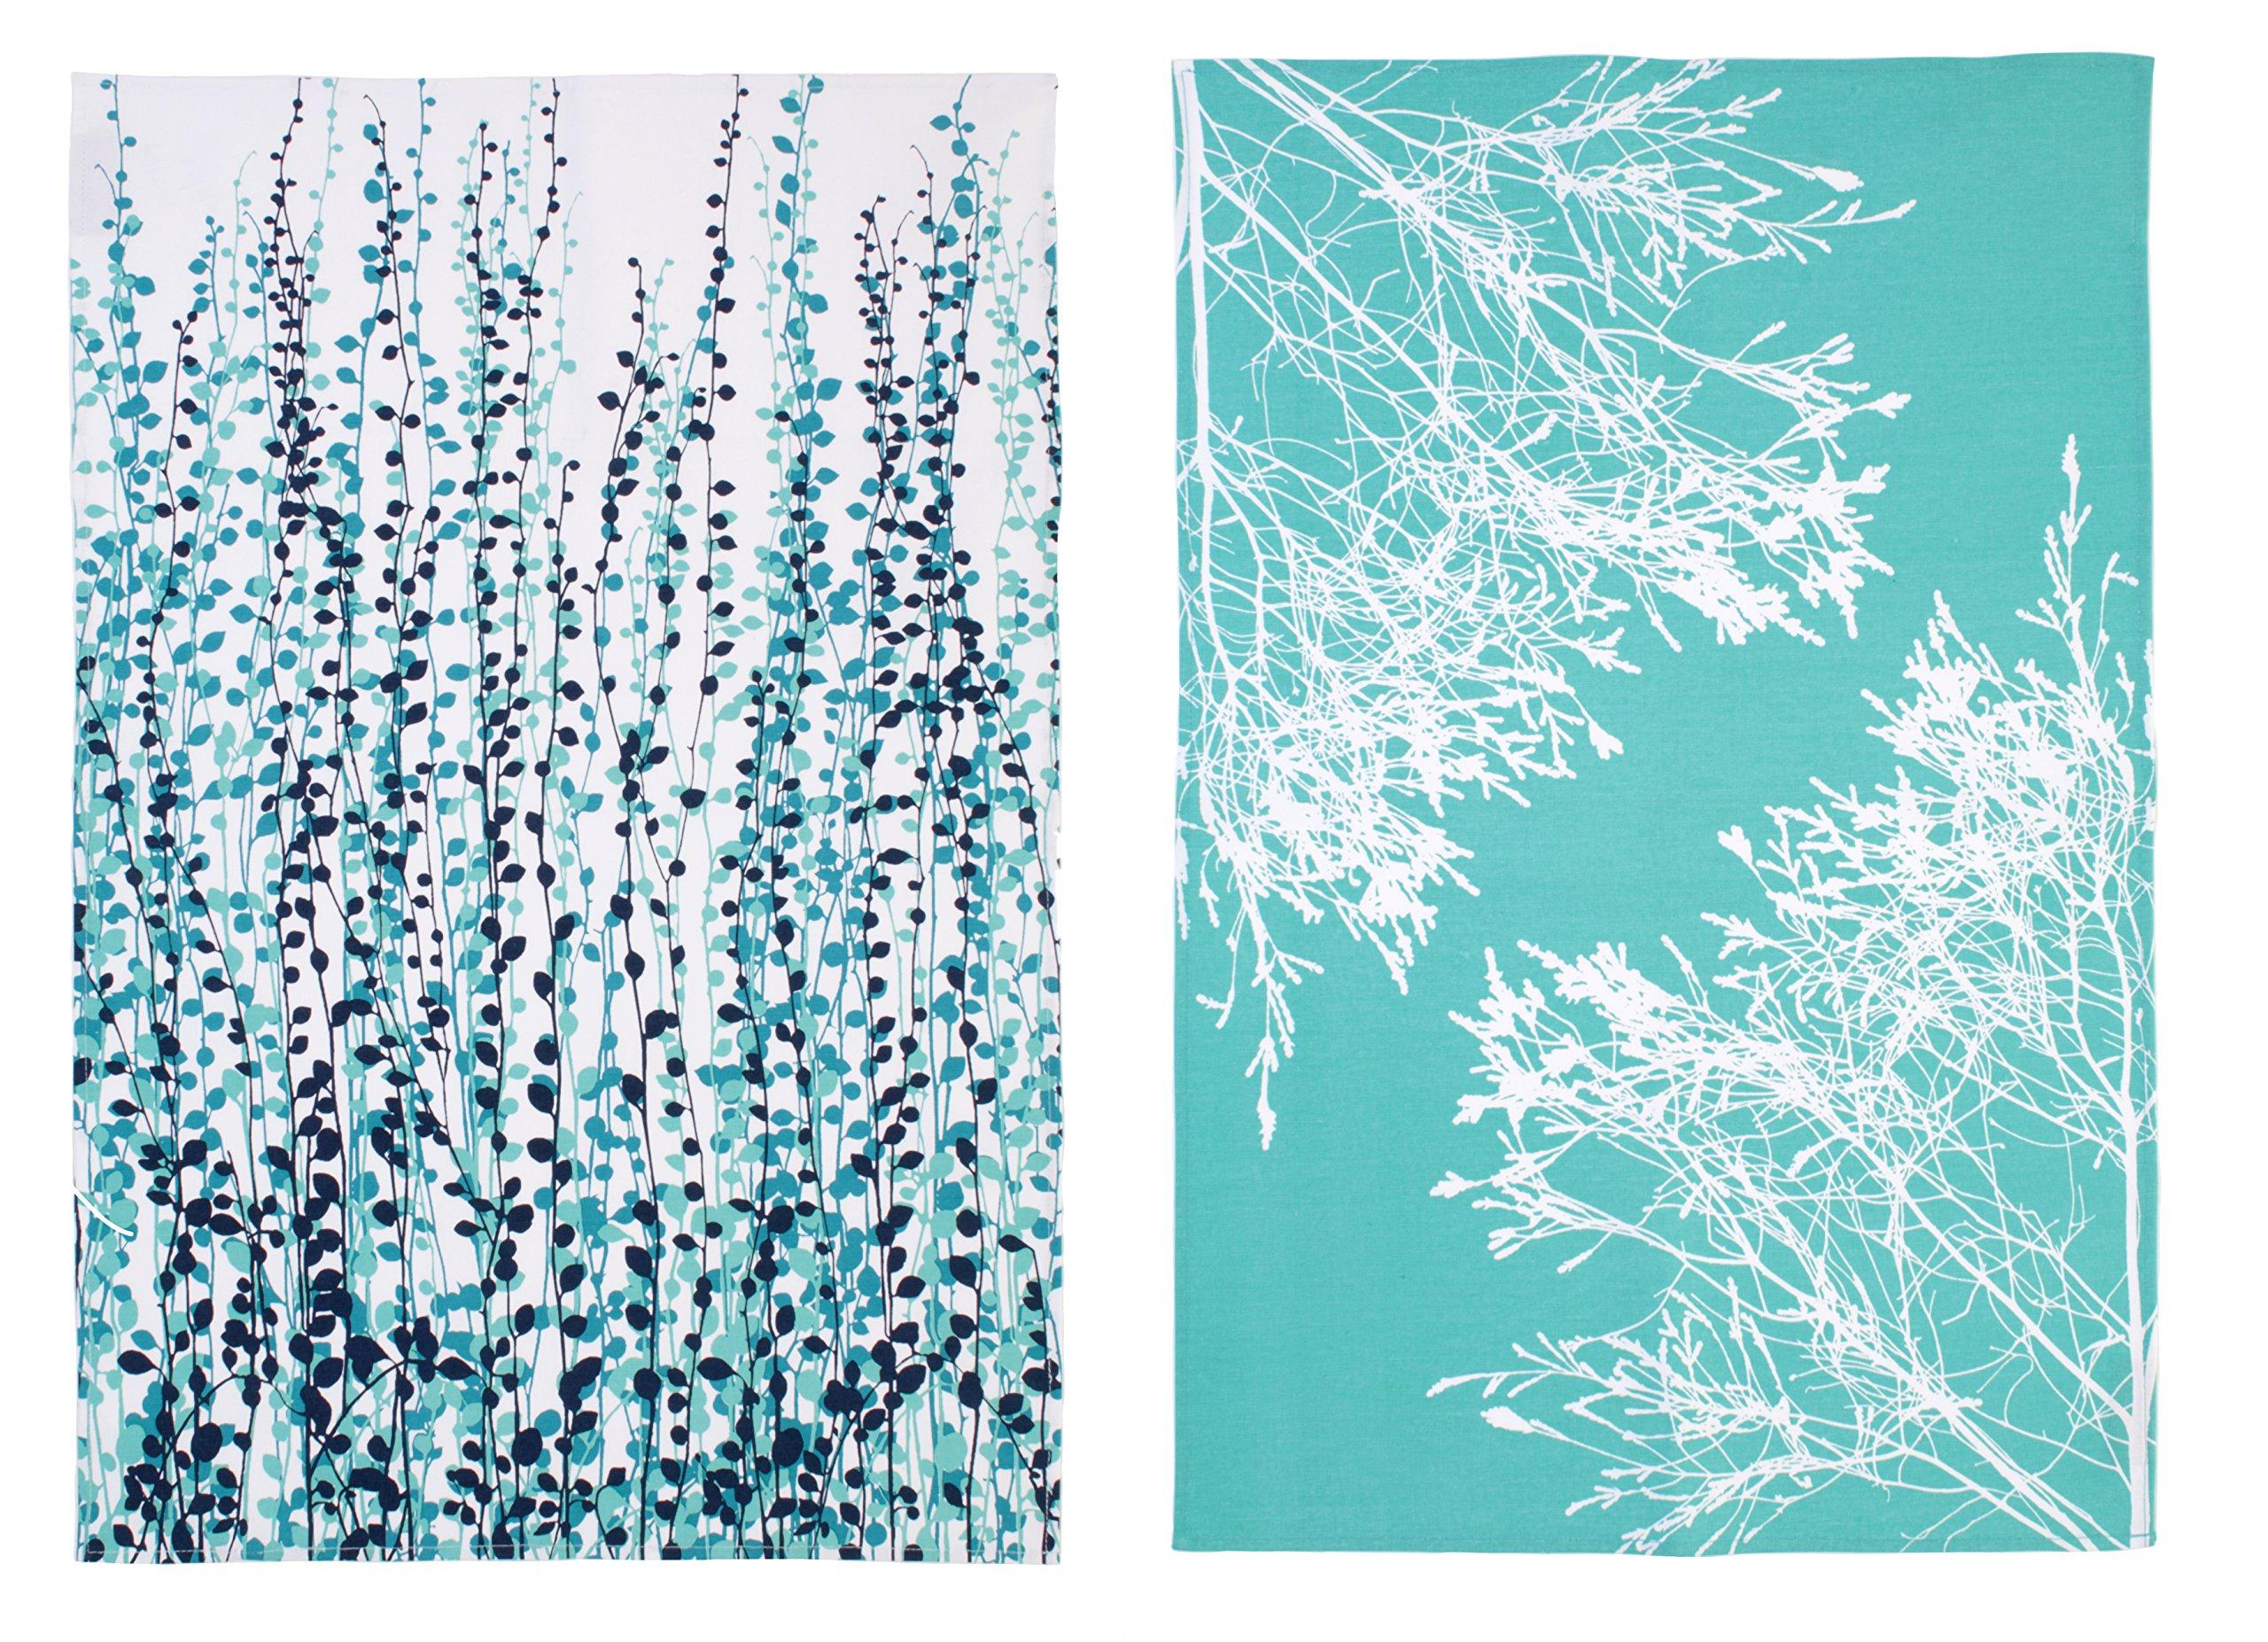 Ulster Weavers Clarissa Hulse CH Blue Fynbos Cotton Tea Towel, 2 Pack by Ulster Weavers